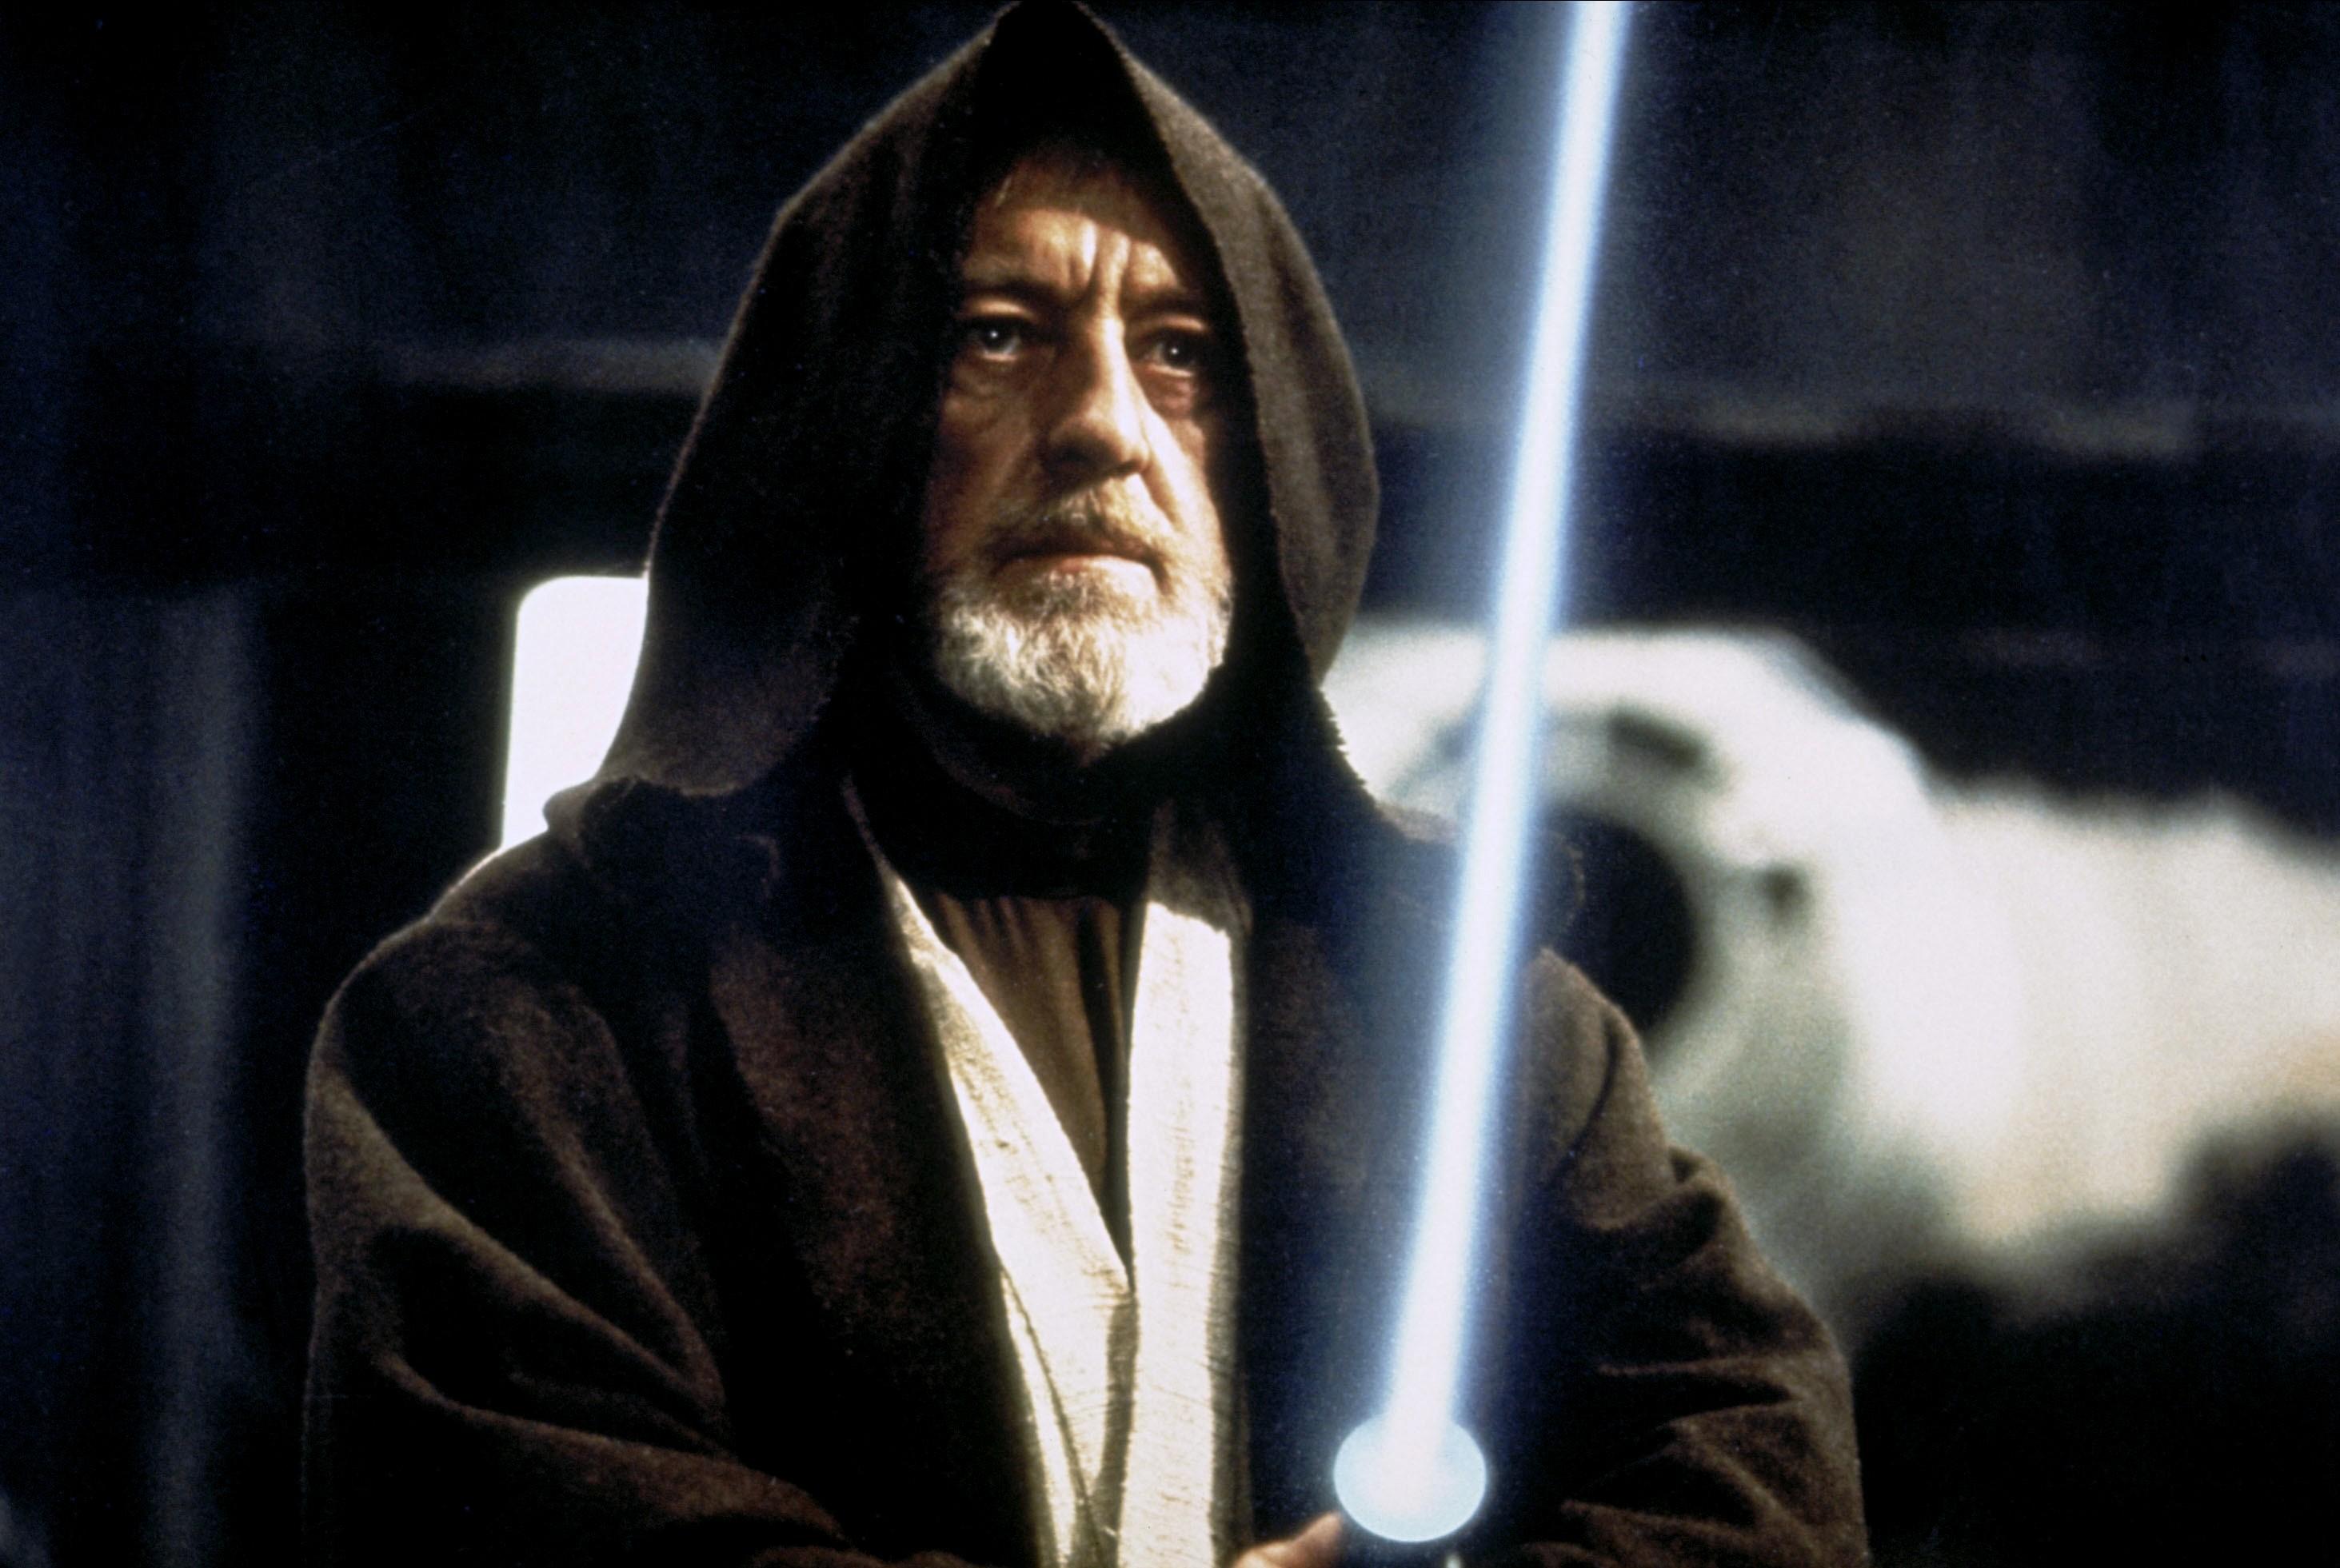 Alec Guinness: Ben Obi-Wan Kenobi  Film 'STAR WARS; STAR WARS: EPISODE IV - A NEW HOPE' (1977)  Directed By GEORGE LUCAS  25 May 1977  AFB6468  Allstar/LUCASFILM